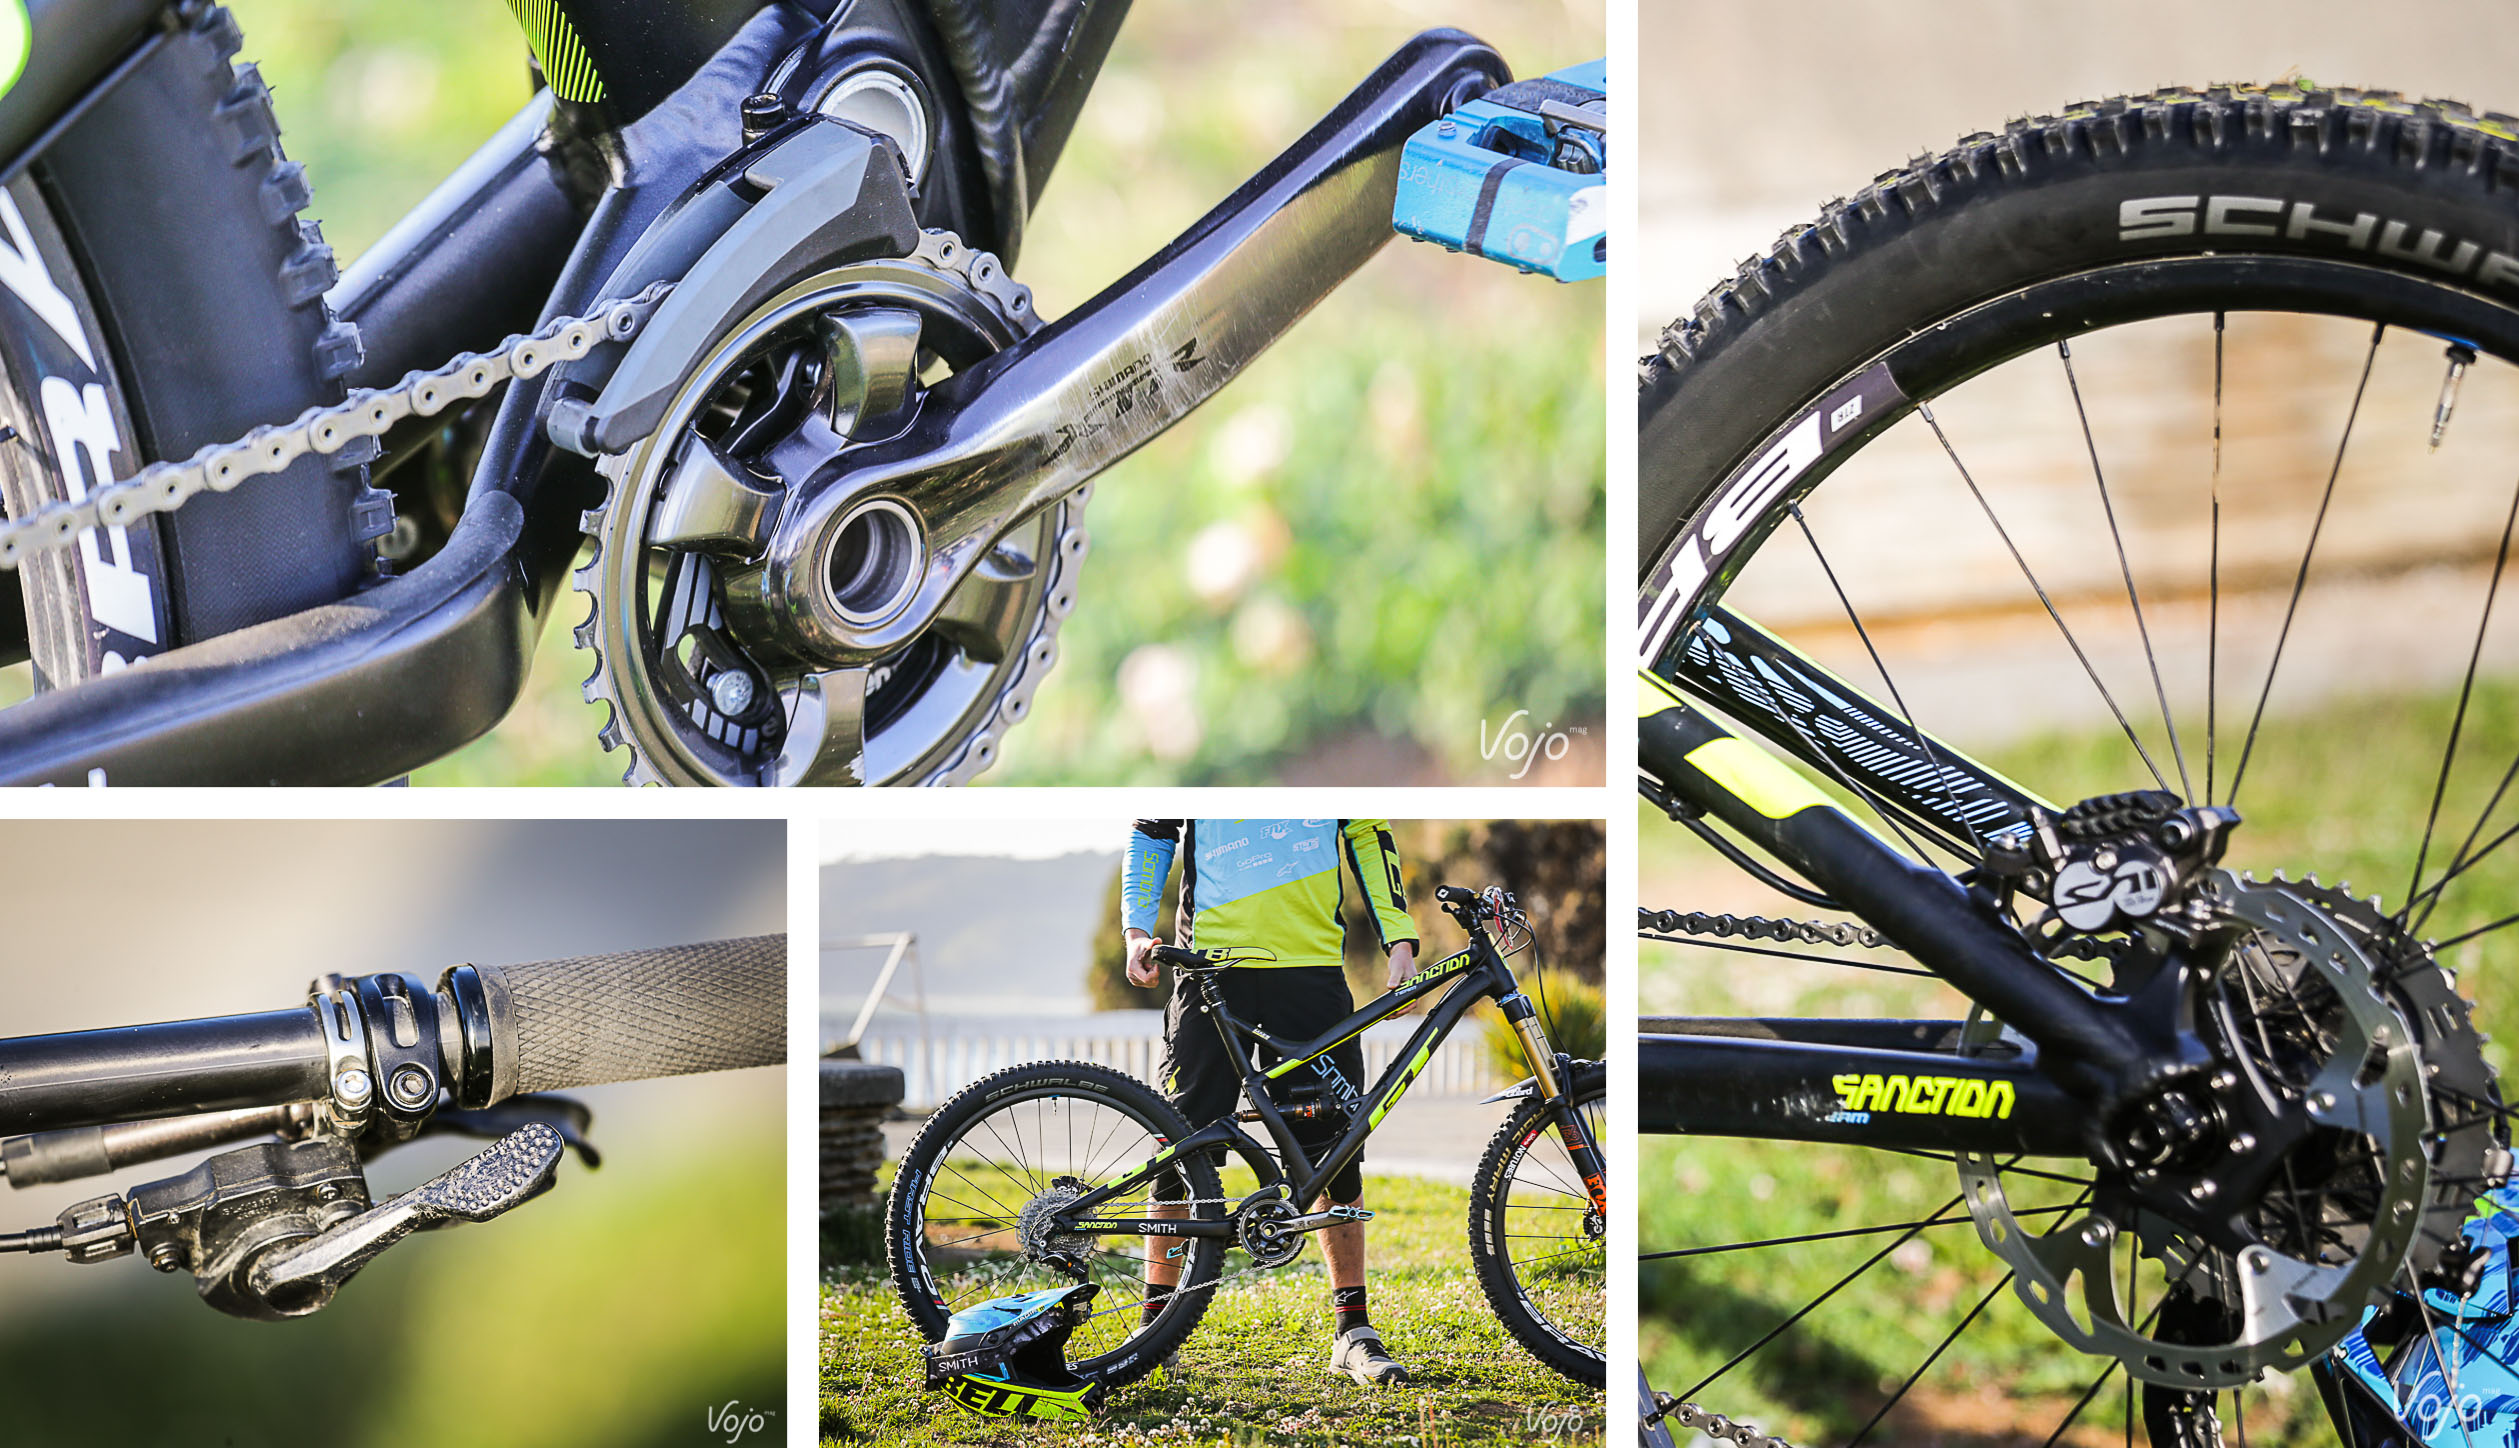 3-Bike_Check_EWS_2016_Copyright_Reuiller_Vojomag-1